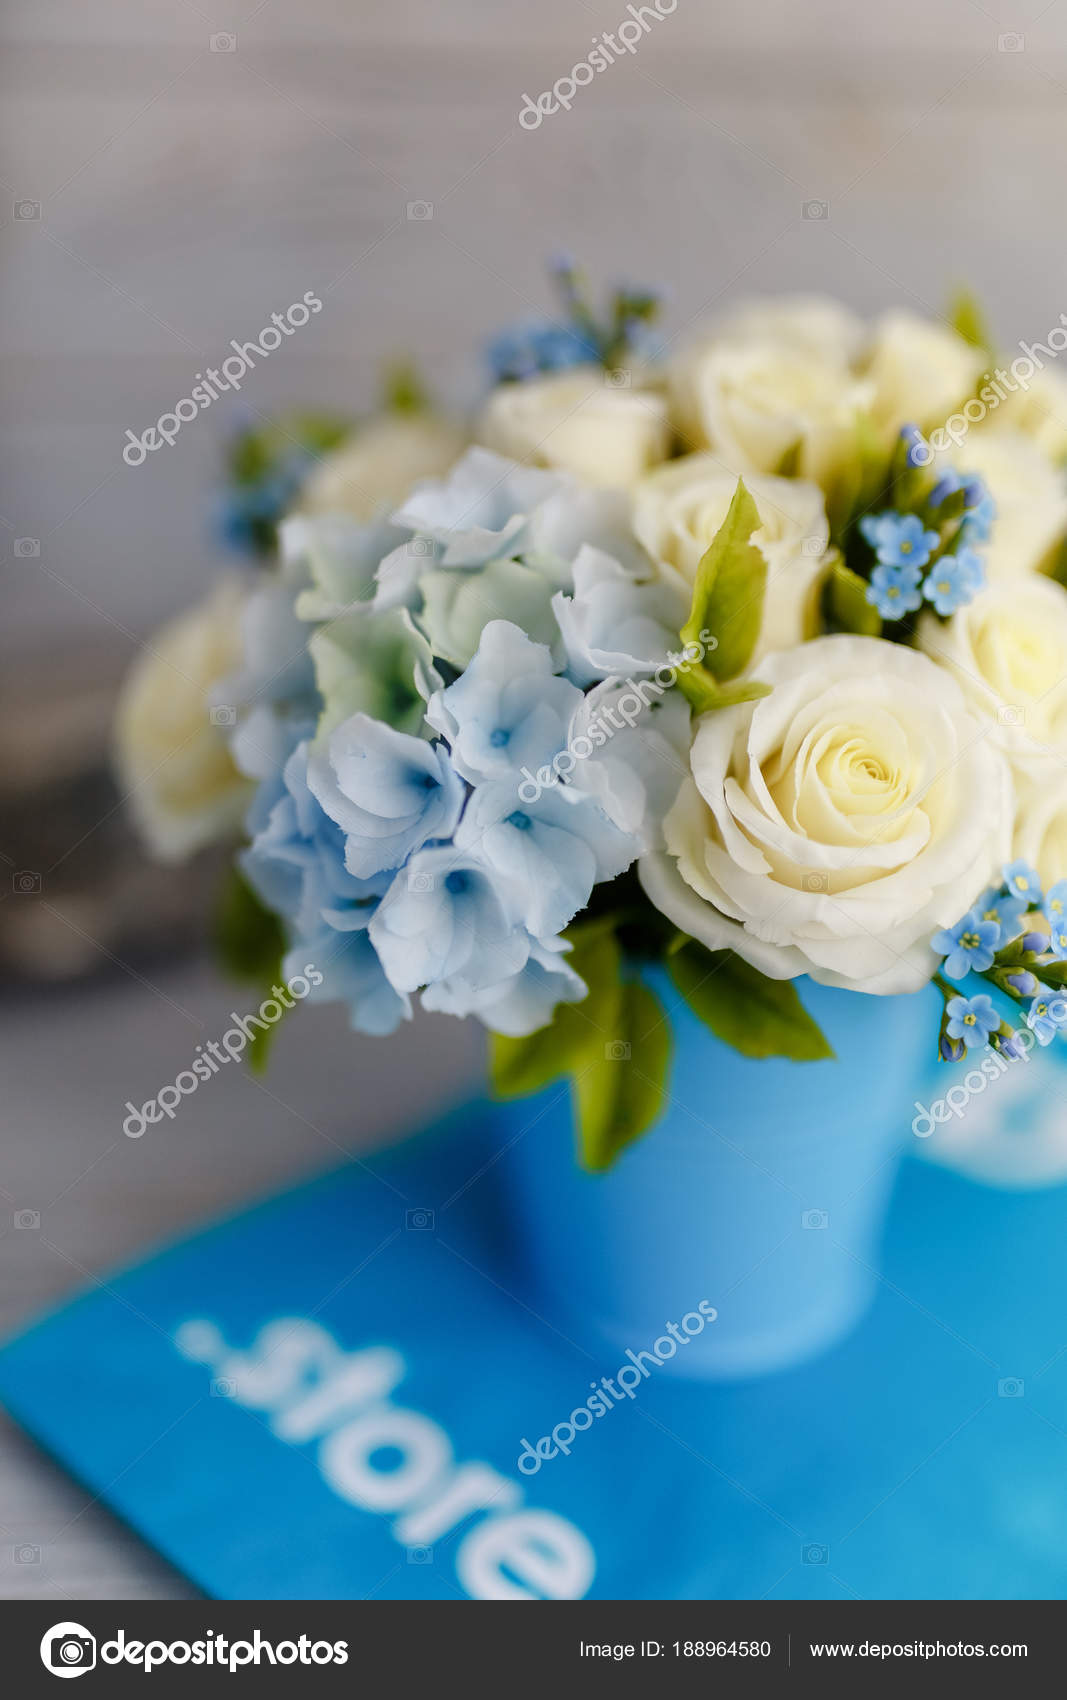 Exquisite spring bouquet blue white wedding flowers wedding floral exquisite spring bouquet blue white wedding flowers wedding floral decorations stock photo izmirmasajfo Choice Image